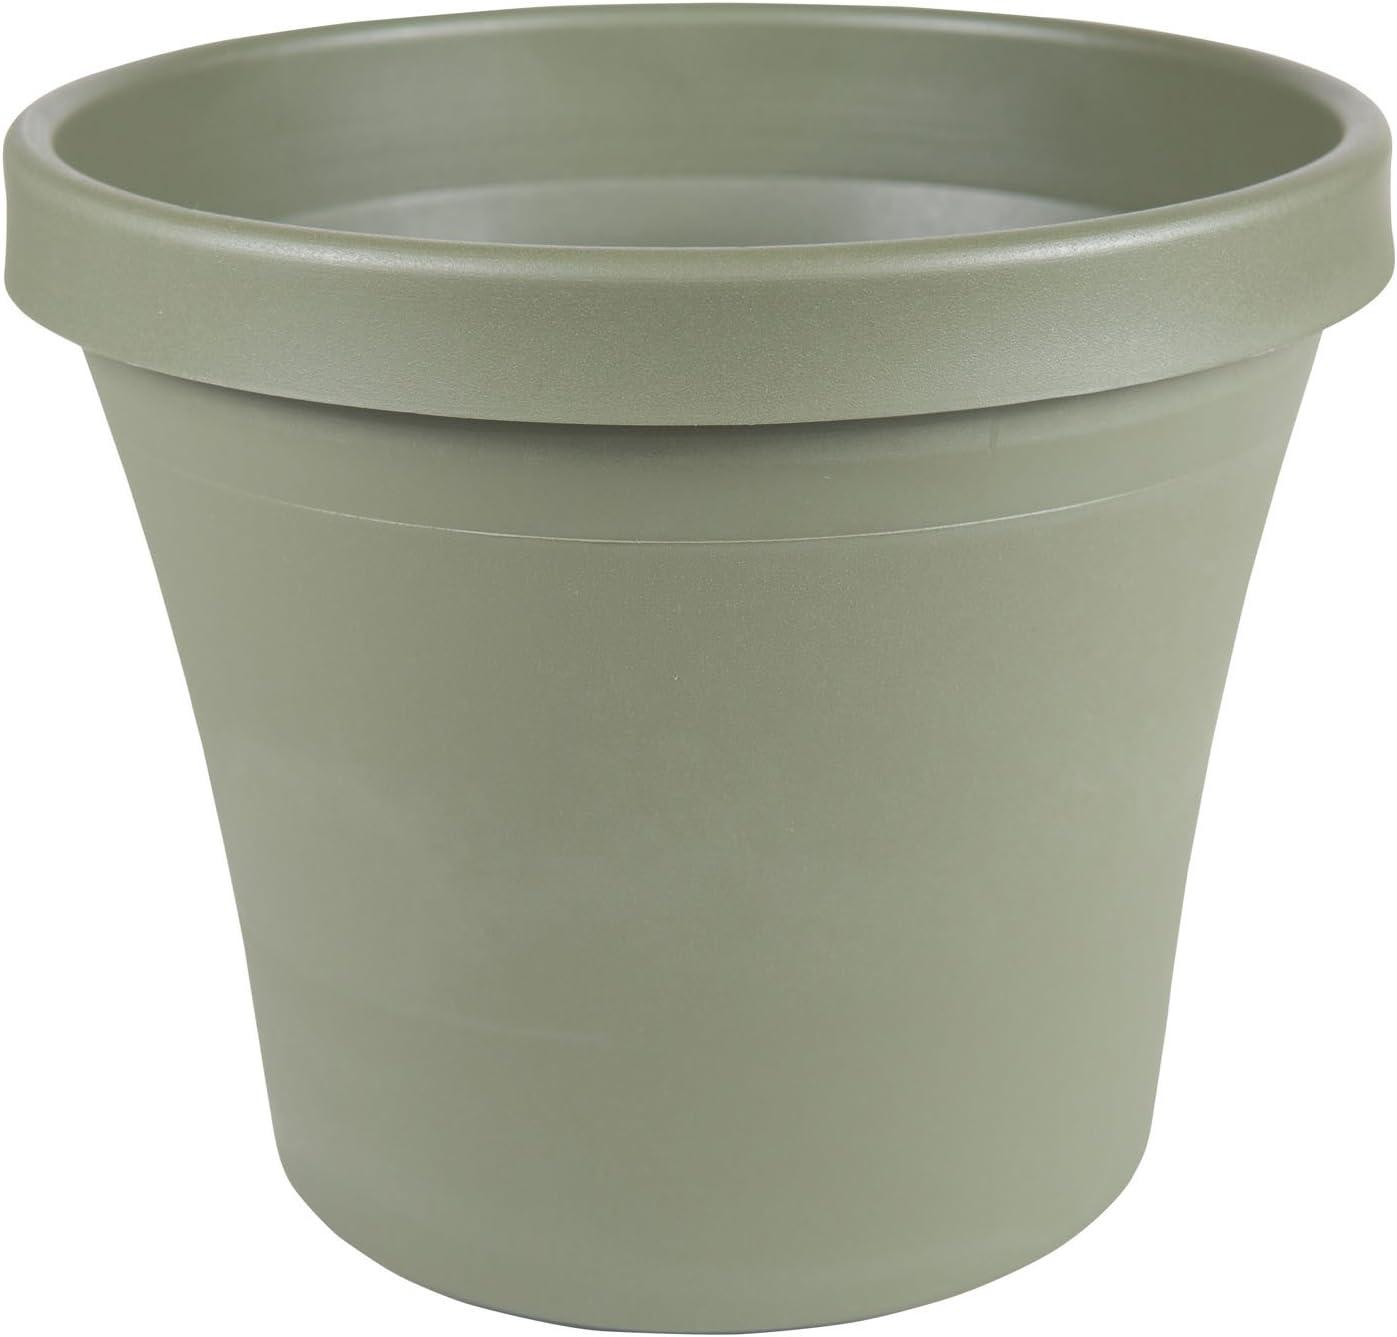 Bloem Terra Pot Planter - 24